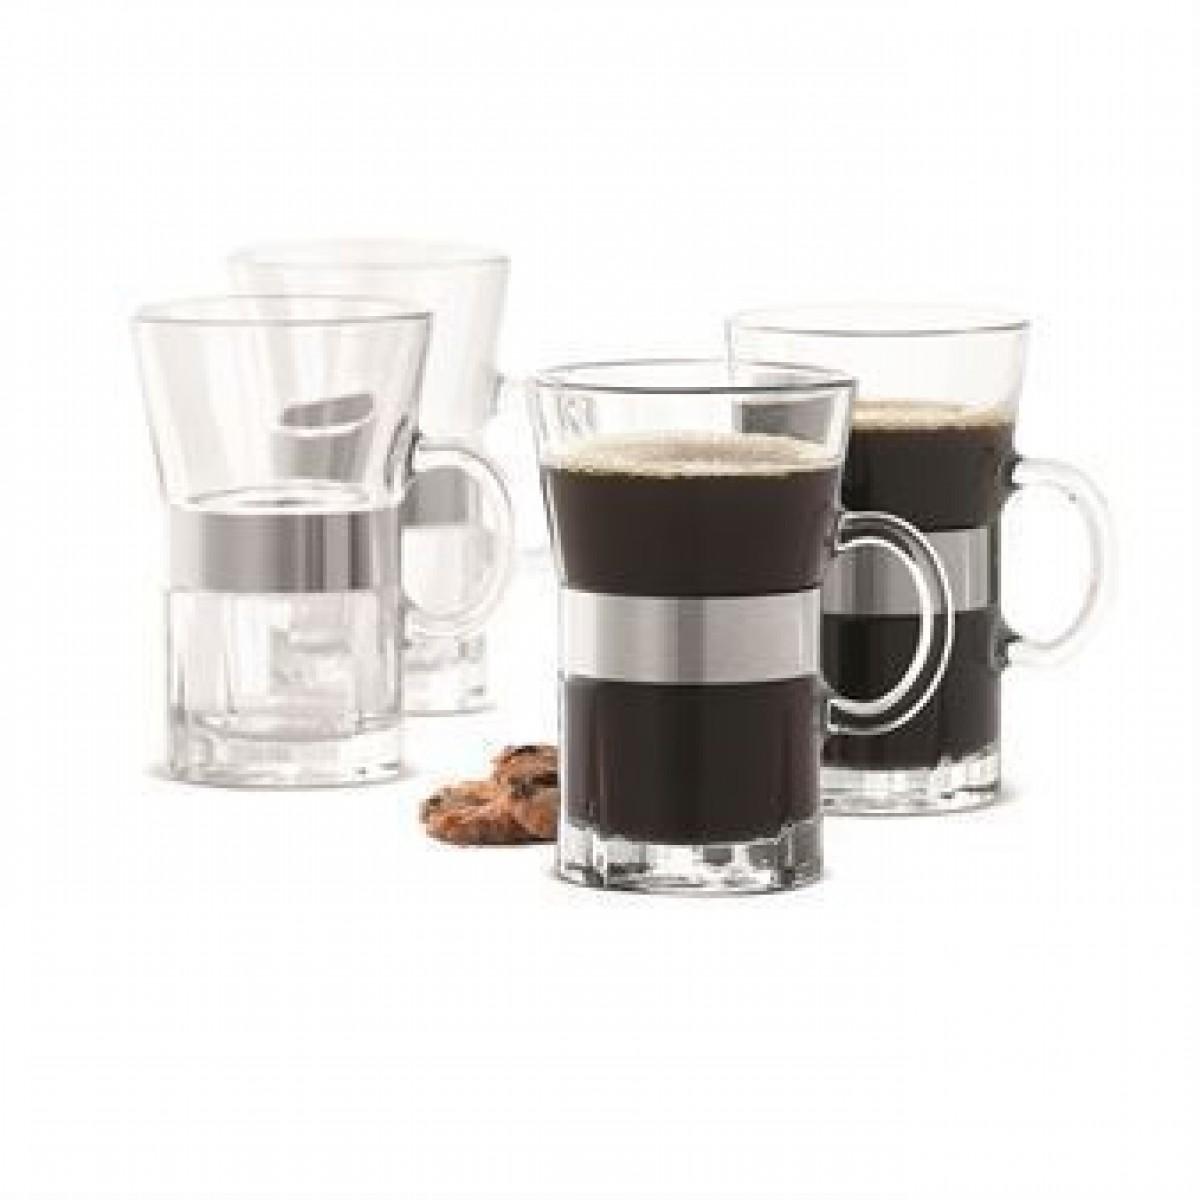 ROSENDAHL Grand Cru hot drink glas 4 stk. 24 cl.